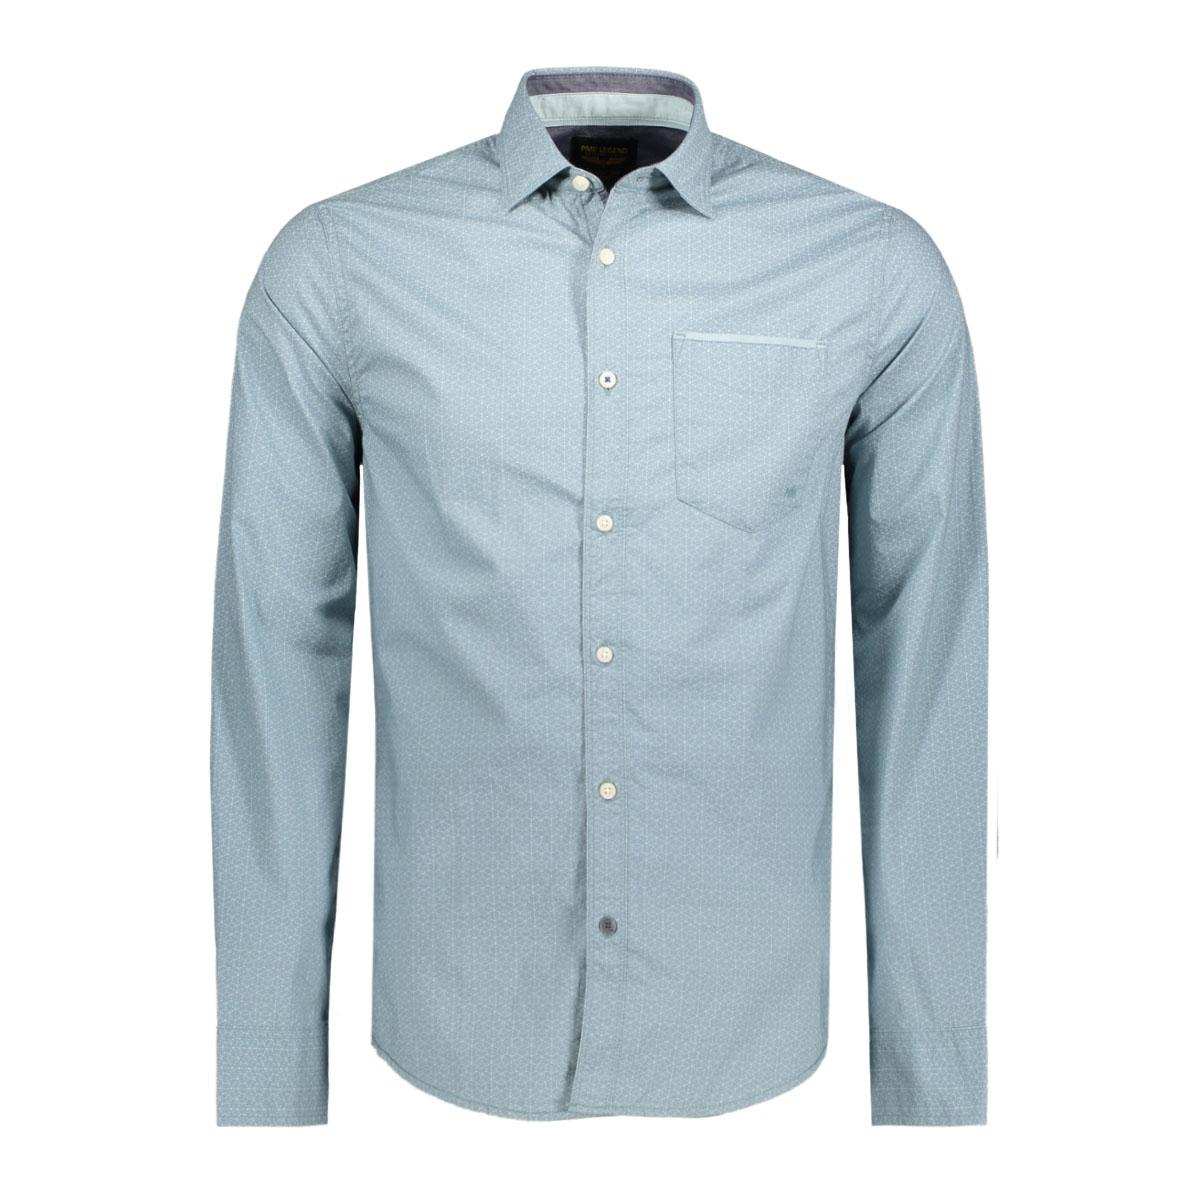 psi177204 pme legend overhemd 5145